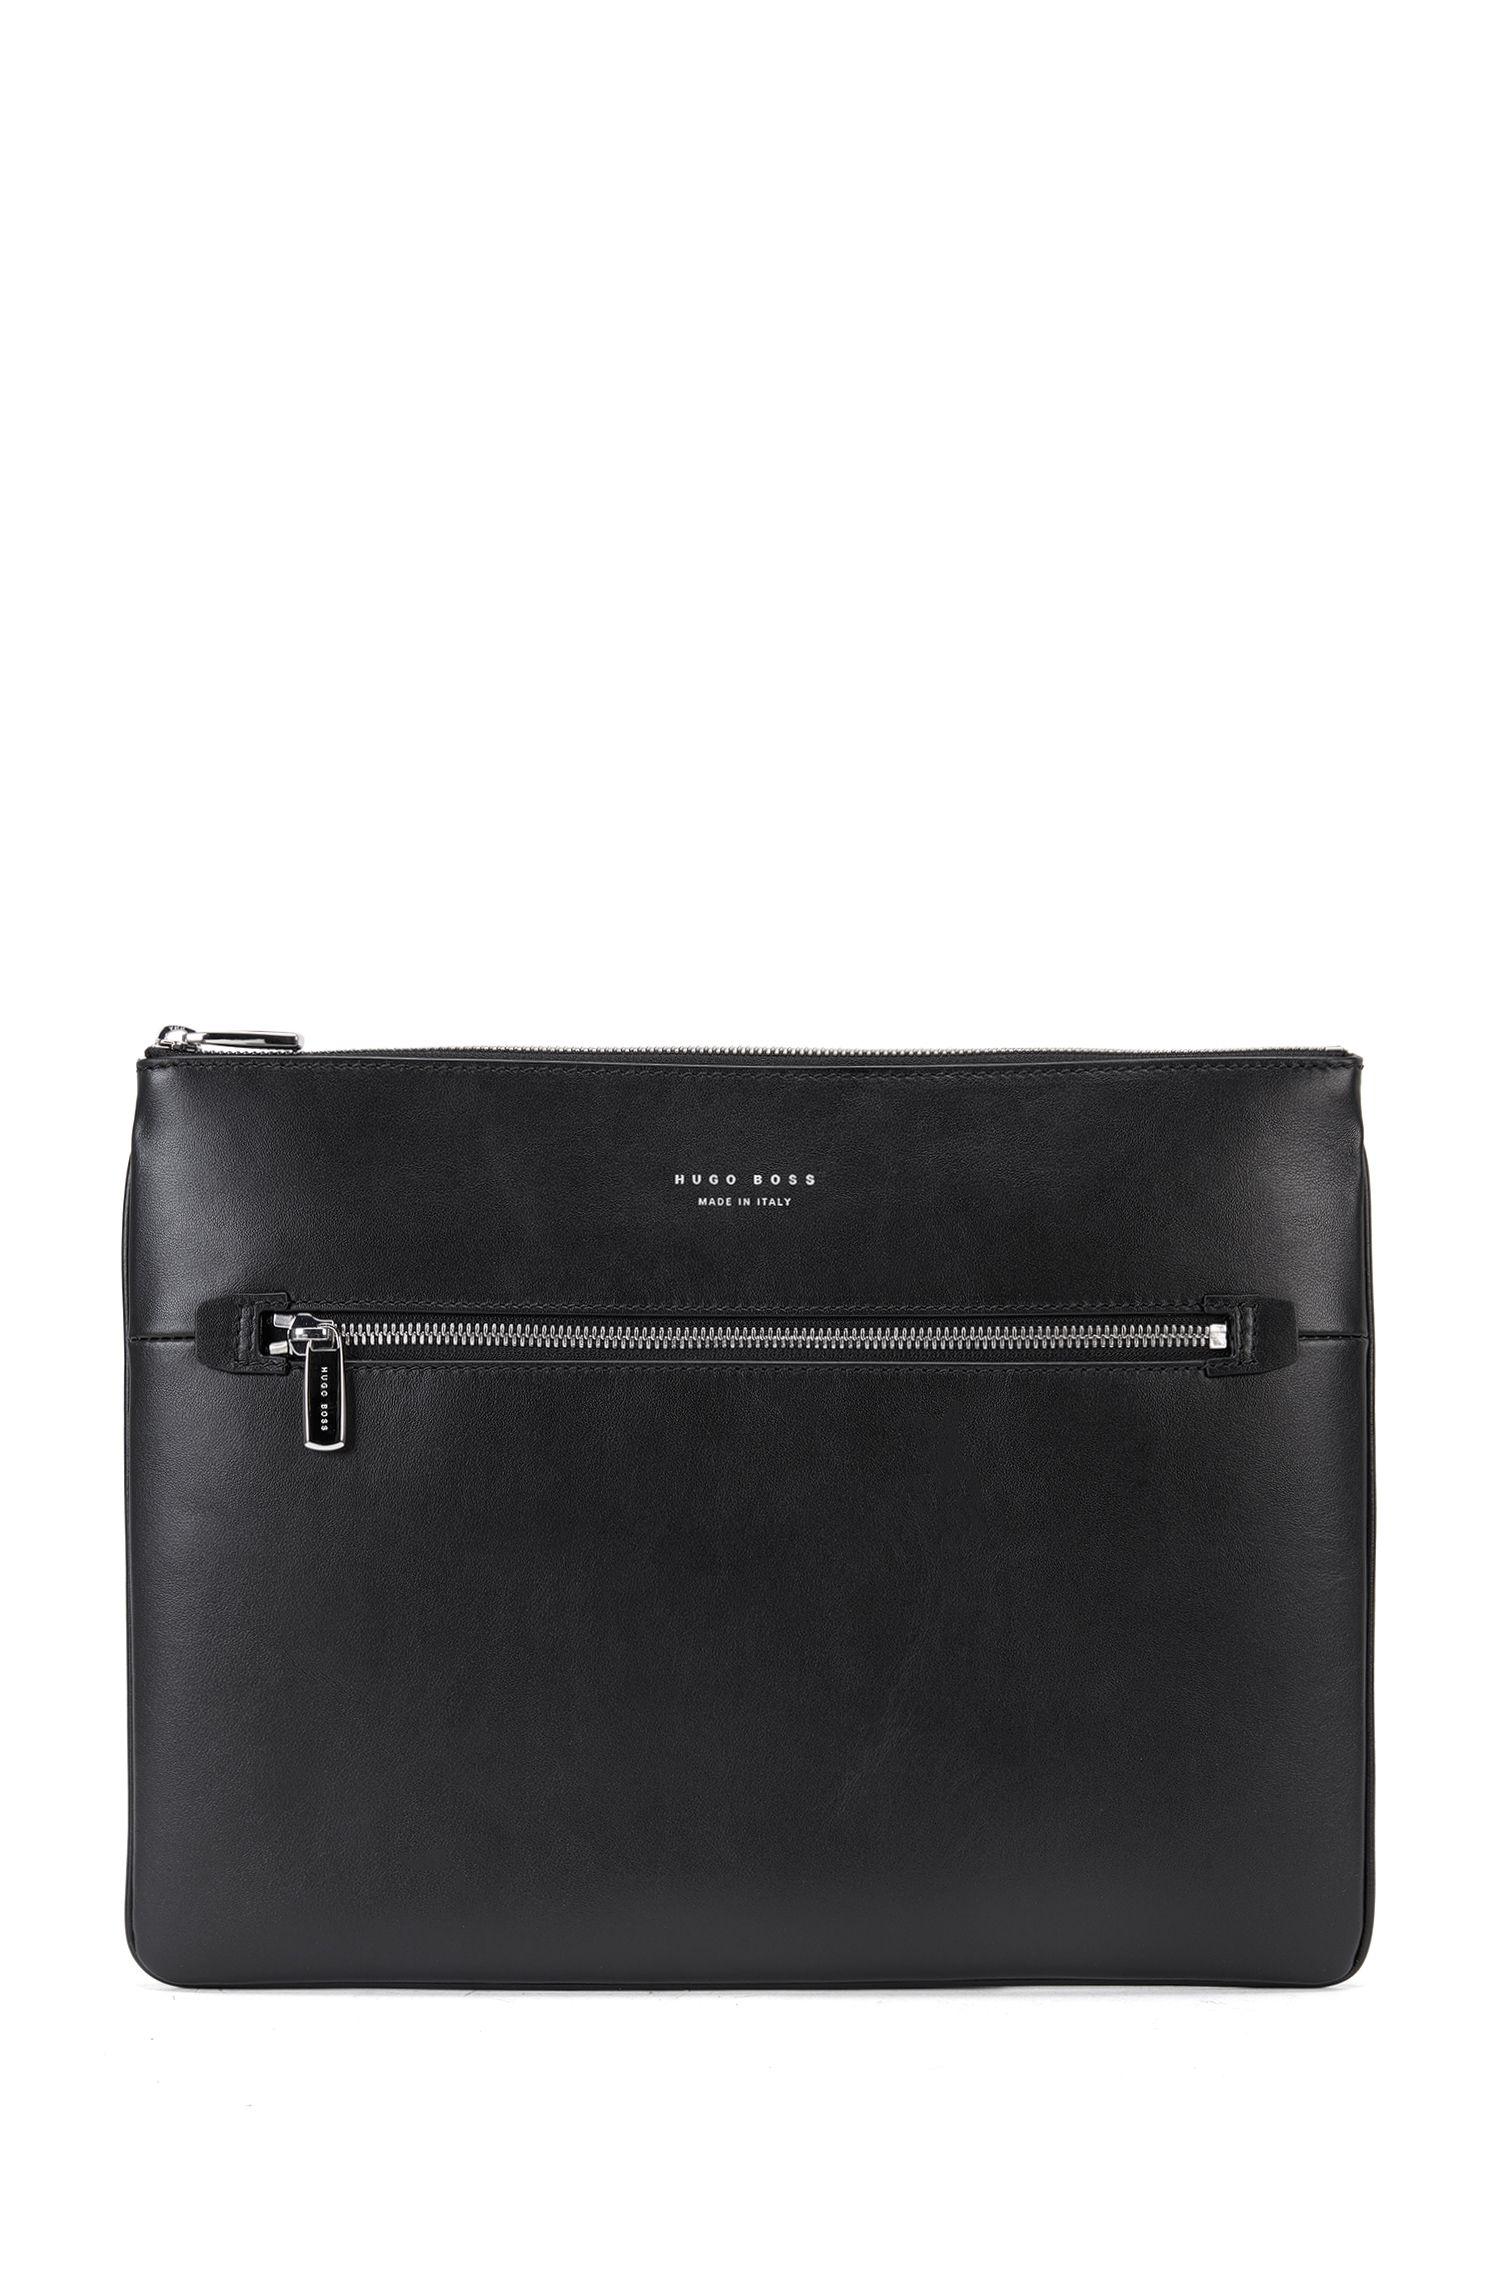 Portfolio case in soft leather with zip closure